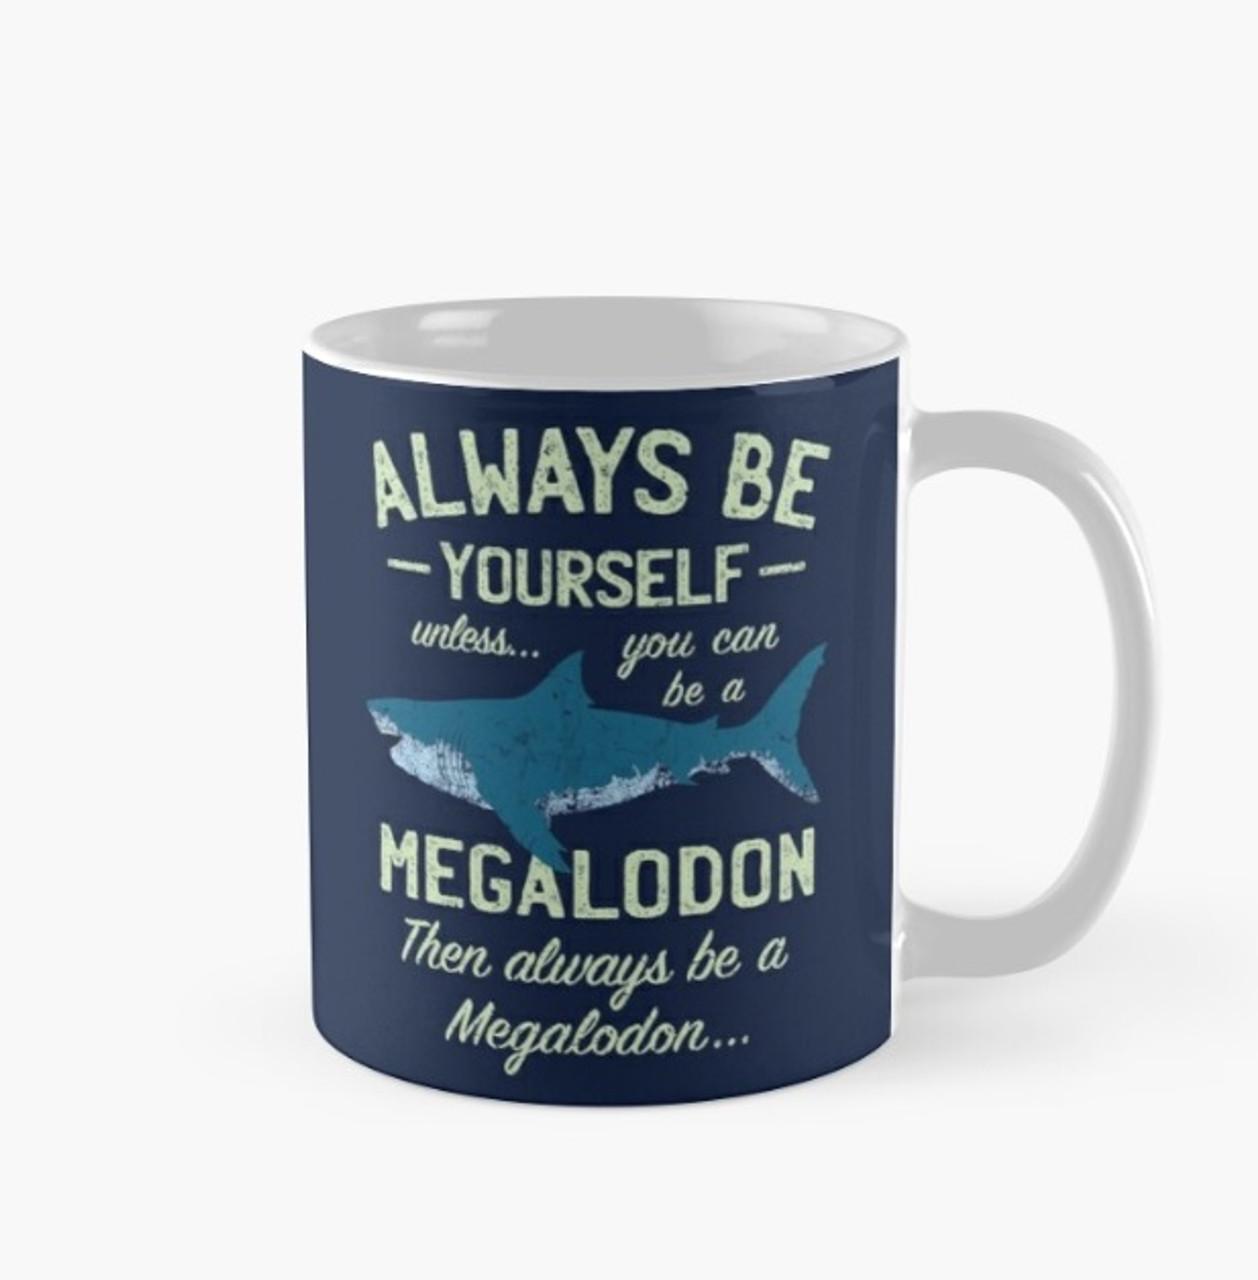 Megalodon Mug